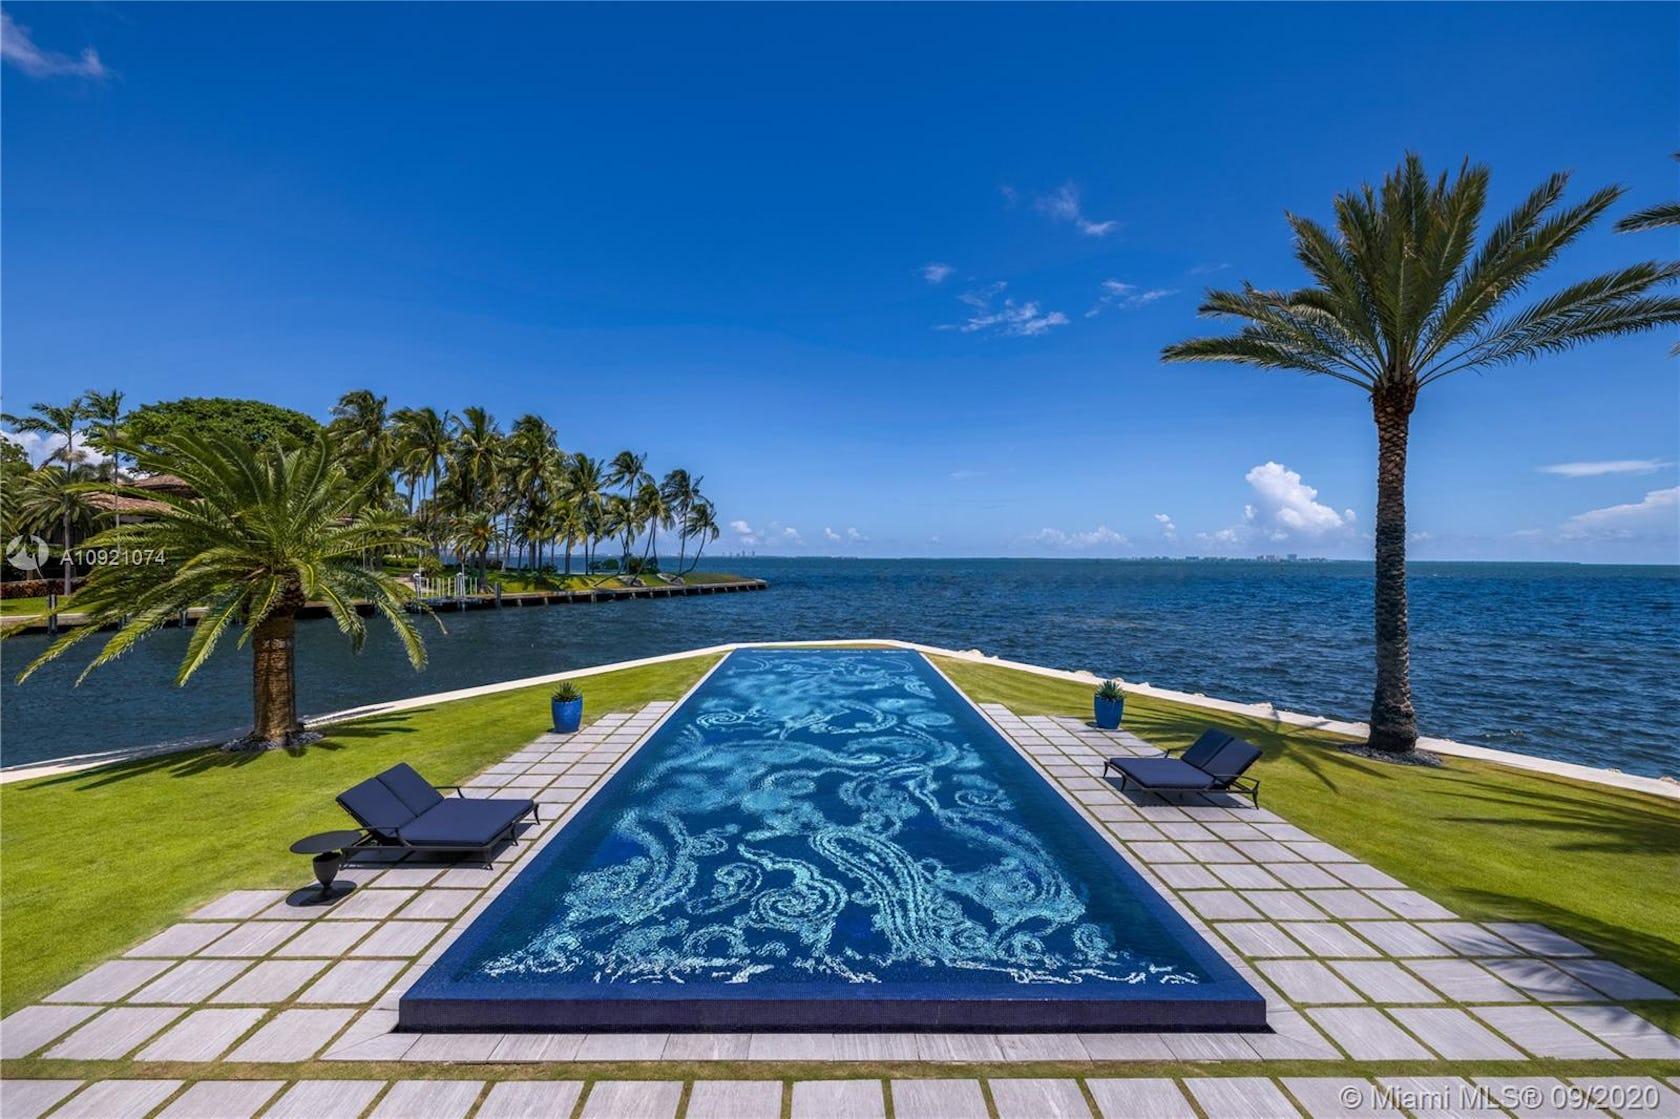 summer pool water hotel building swimming pool resort tropical